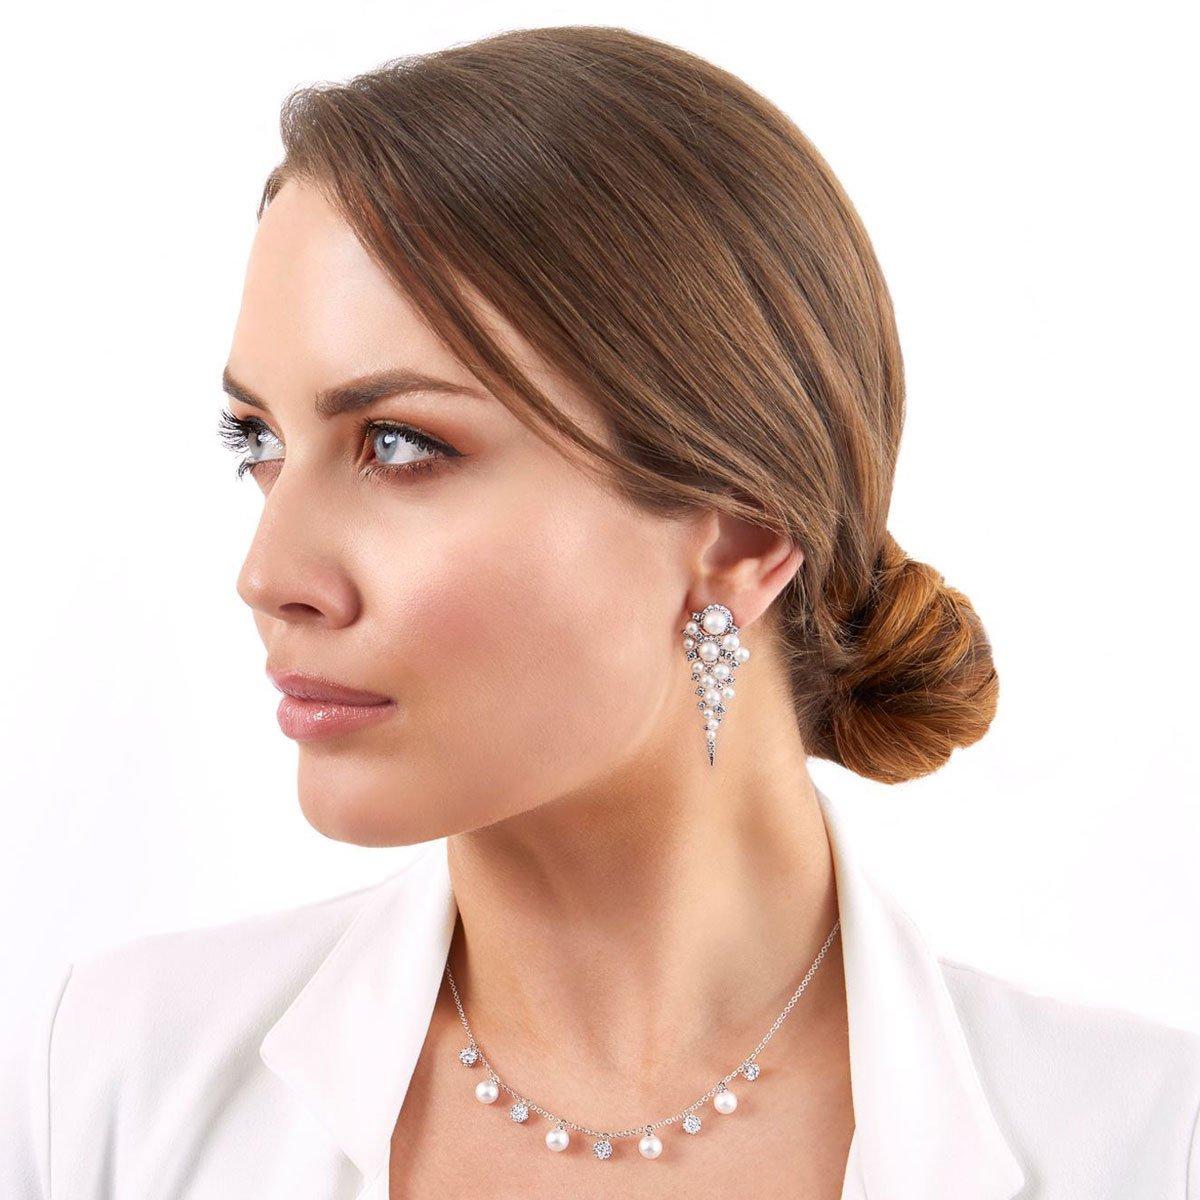 0001706 raindrop akoya pearl and diamond earrings in 18ct white gold